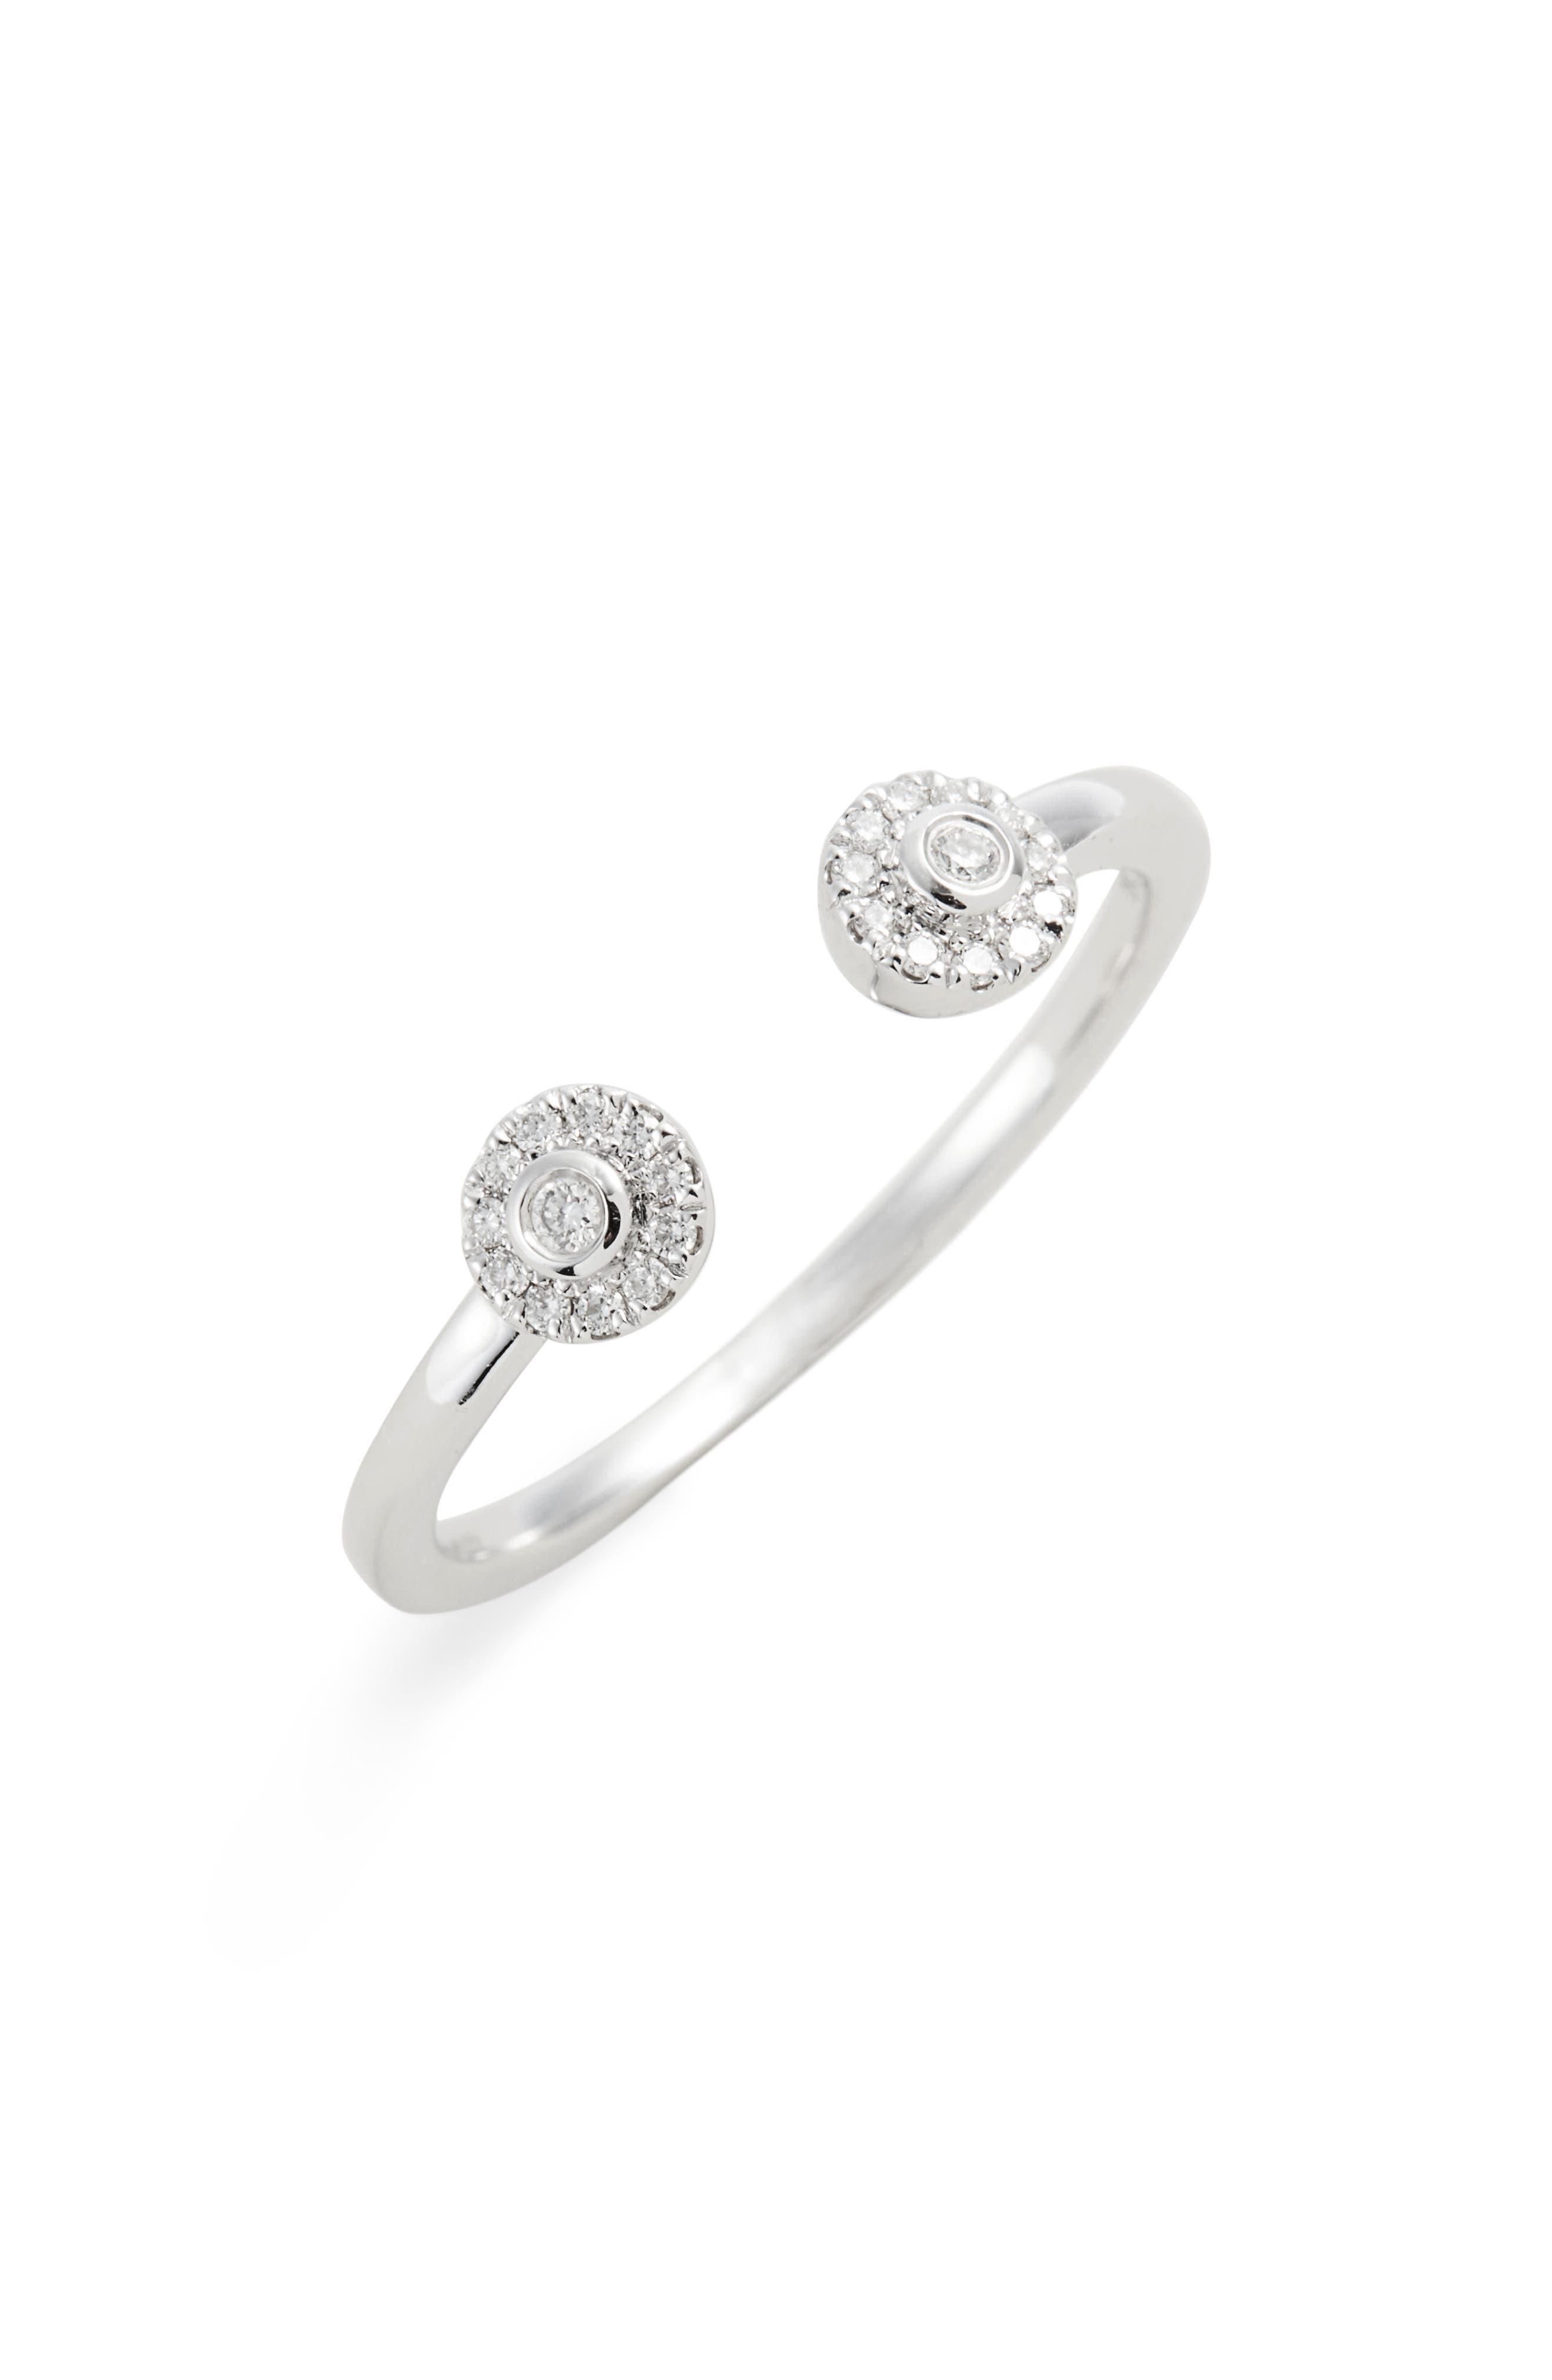 Lauren Joy Open Diamond Ring,                             Main thumbnail 1, color,                             711